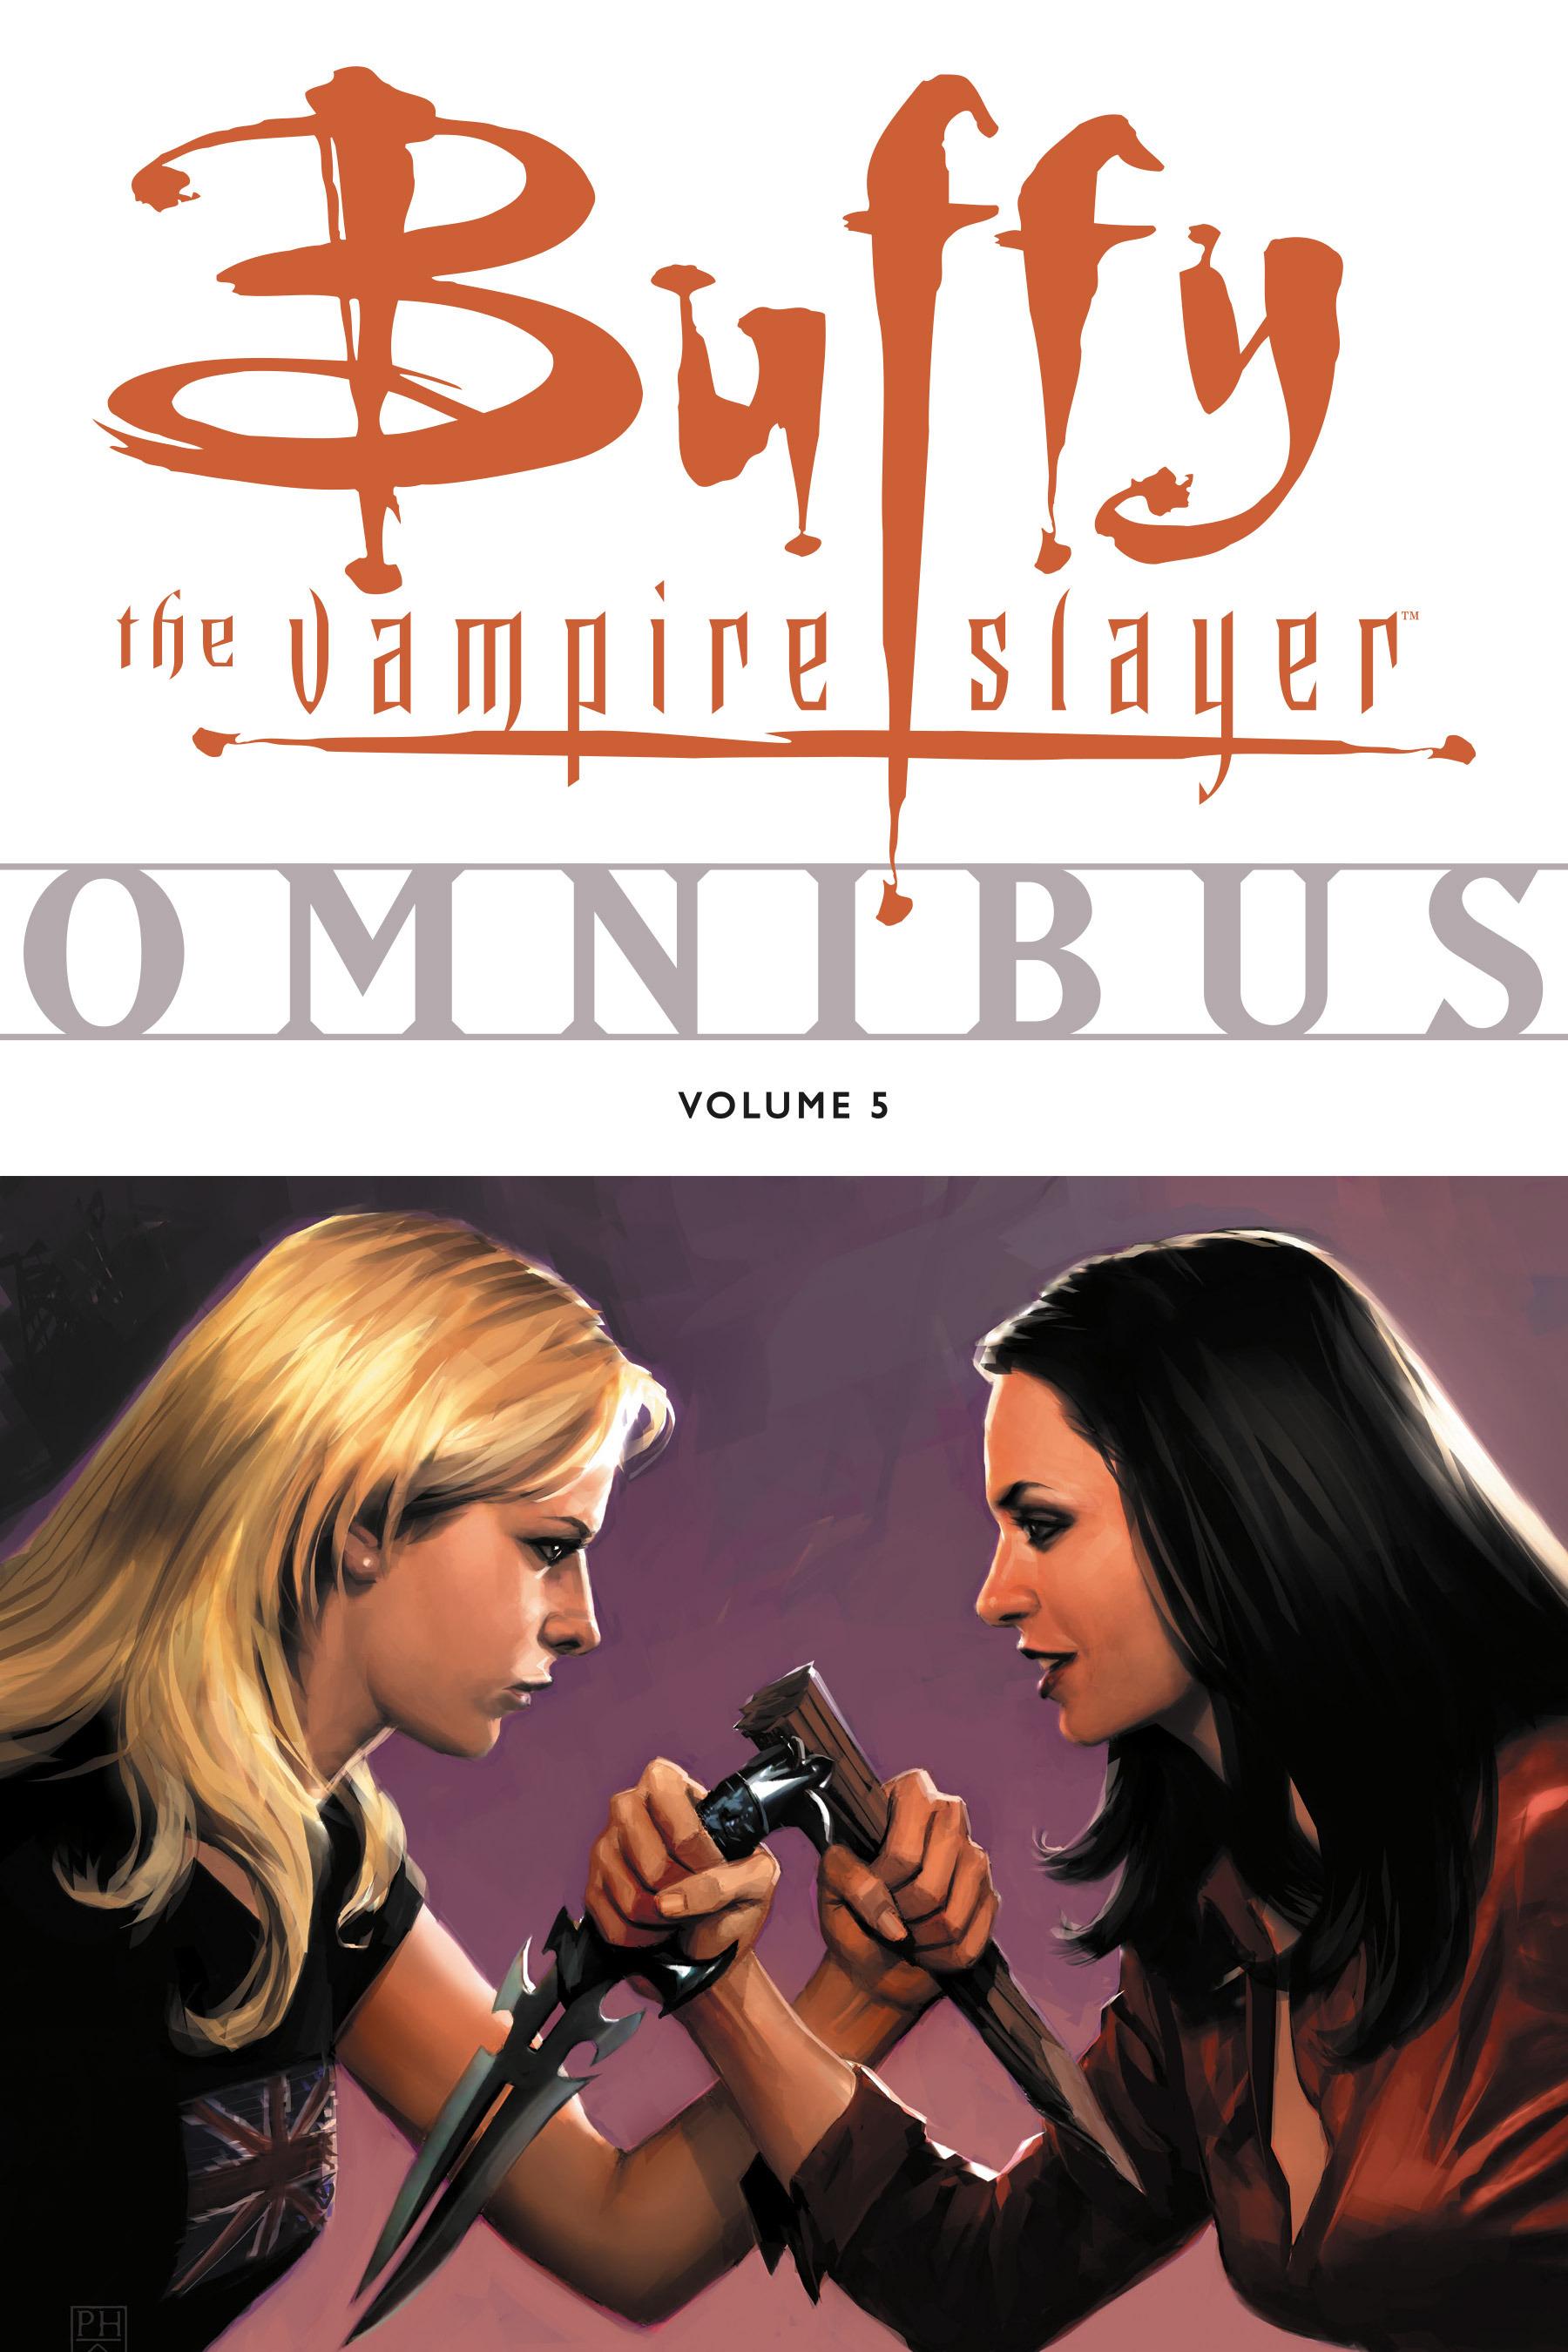 Read online Buffy the Vampire Slayer: Omnibus comic -  Issue # TPB 5 - 1